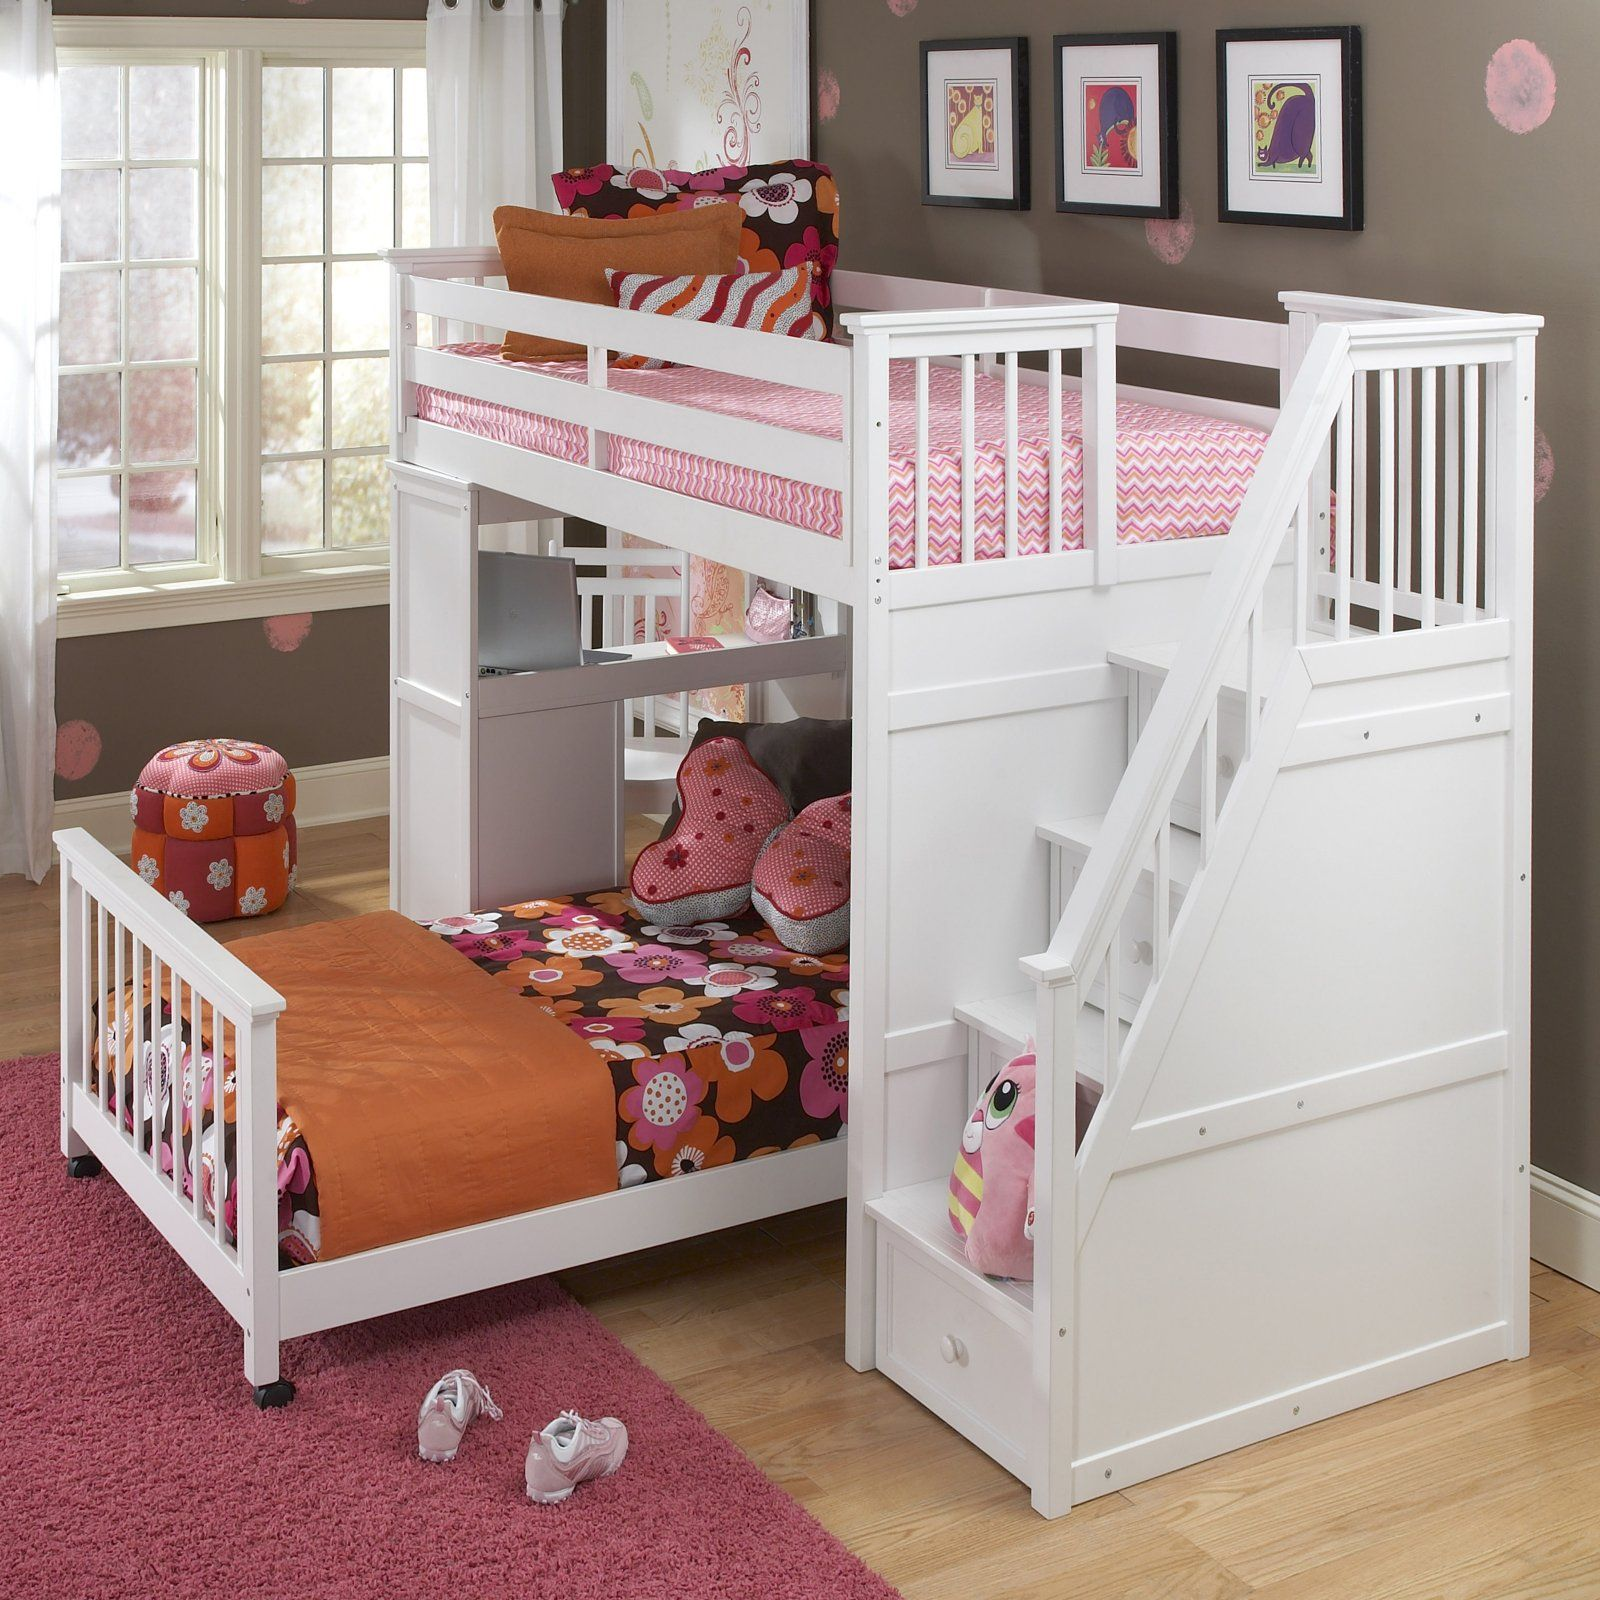 Boys' twin loft bed with storage steps  Schoolhouse Stairway Loft Bed  White  Modüler mobilya  Pinterest